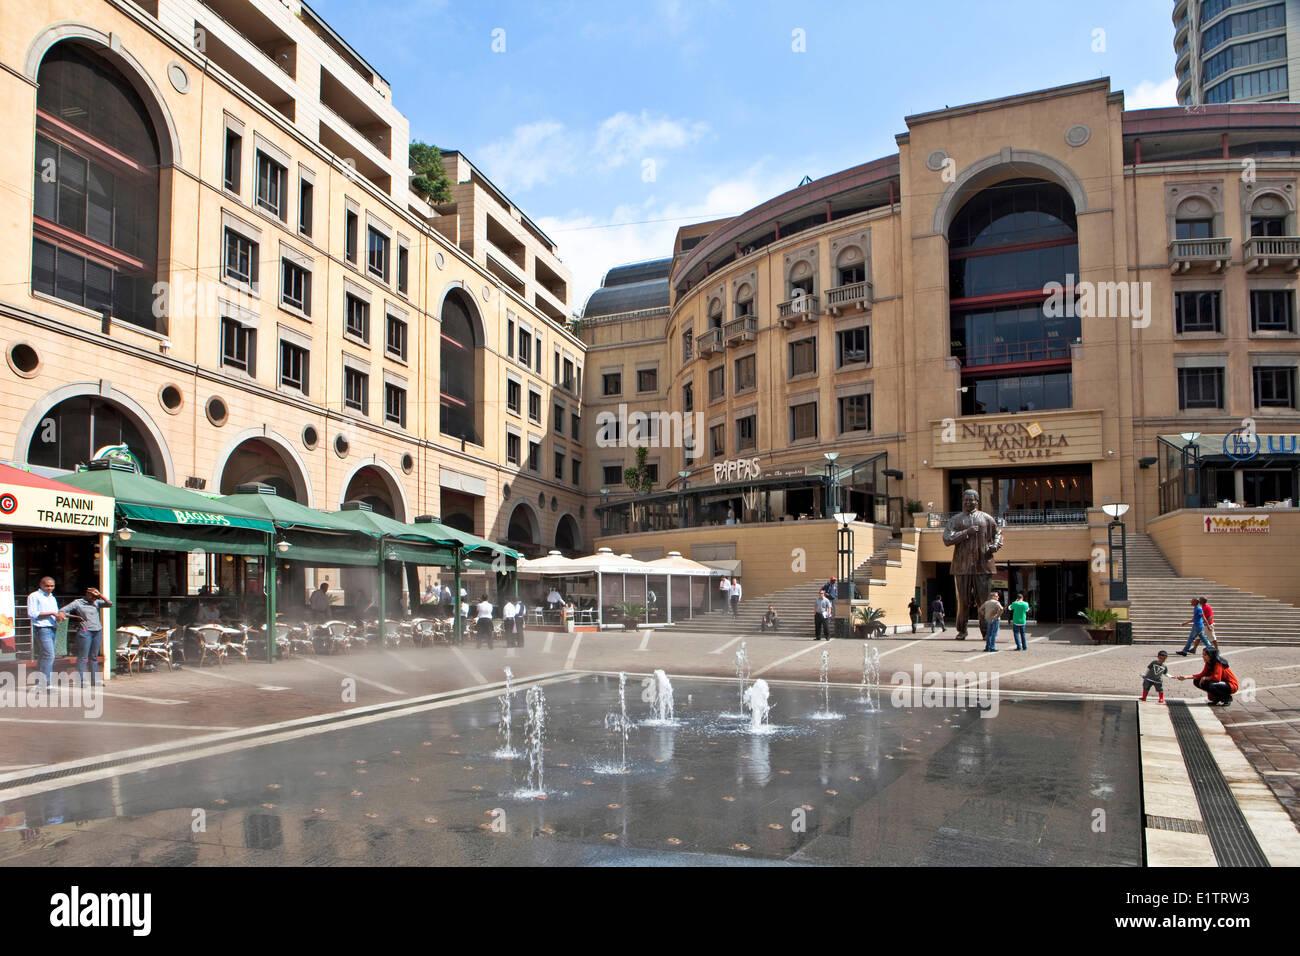 Nelson Mandela Square, Johannesburg, Sud Africa Immagini Stock